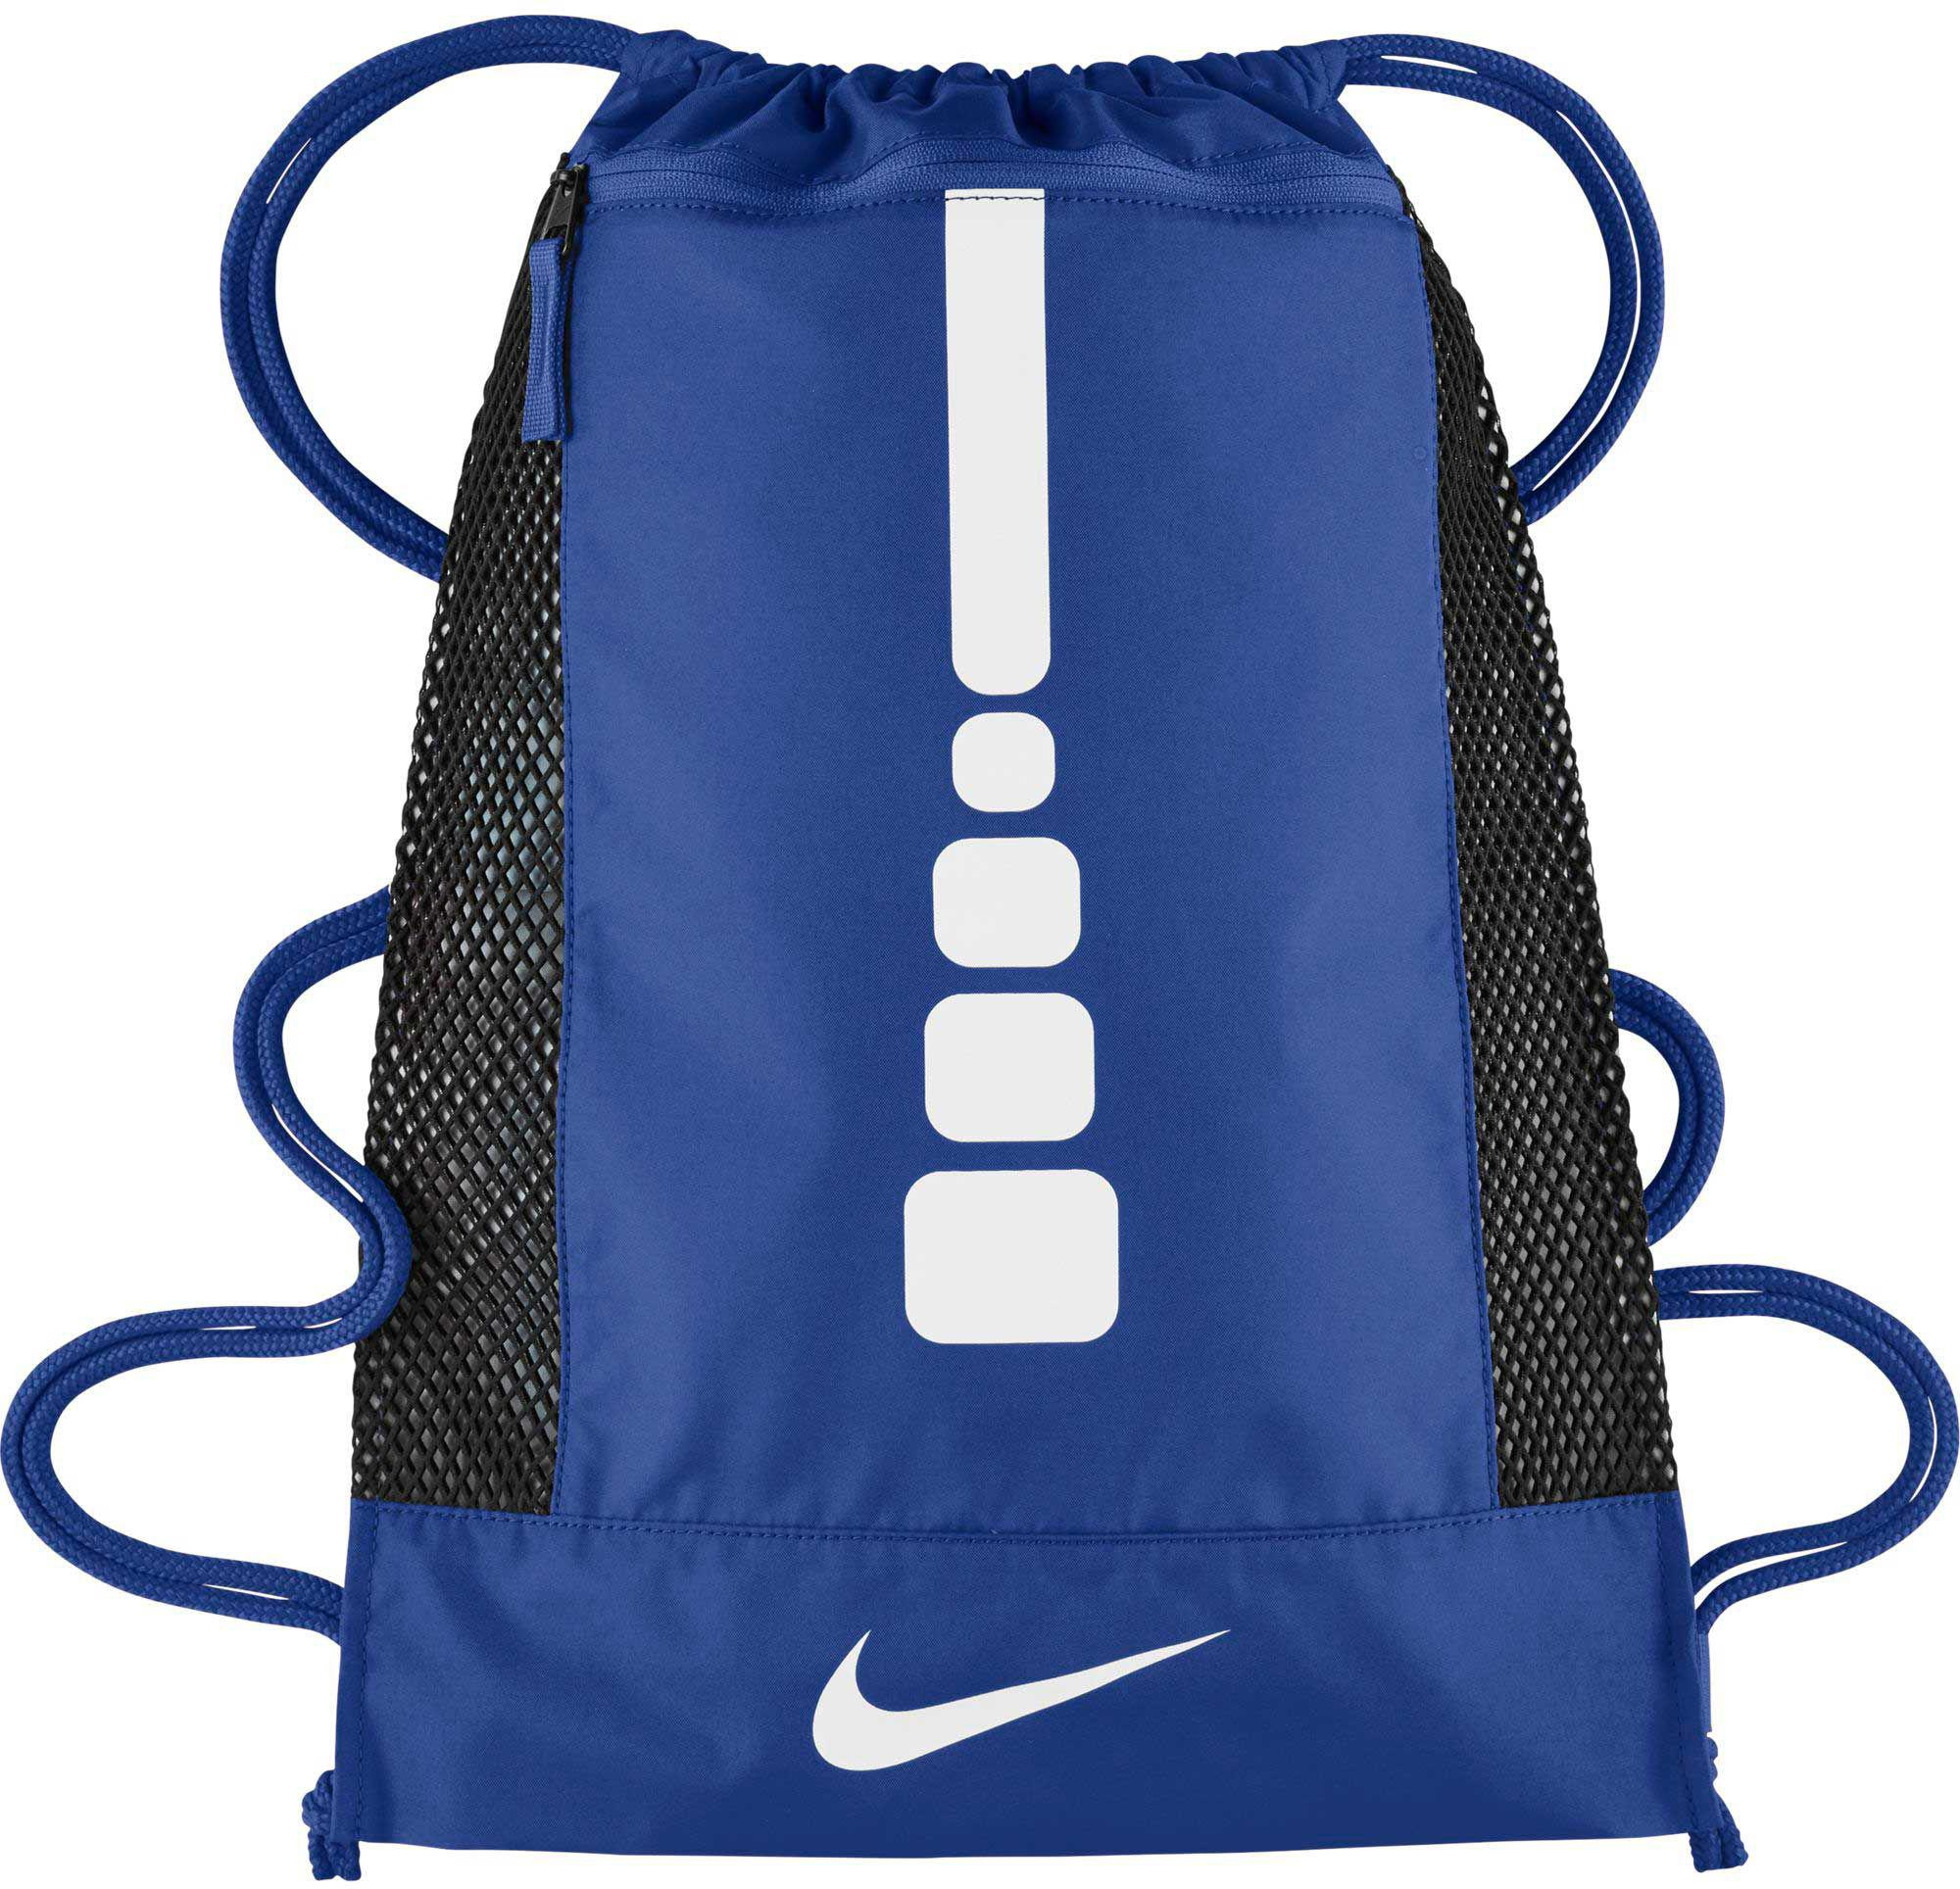 Lyst - Nike Hoops Elite Gym Sack Pack in Blue for Men d5e768fadbcd2